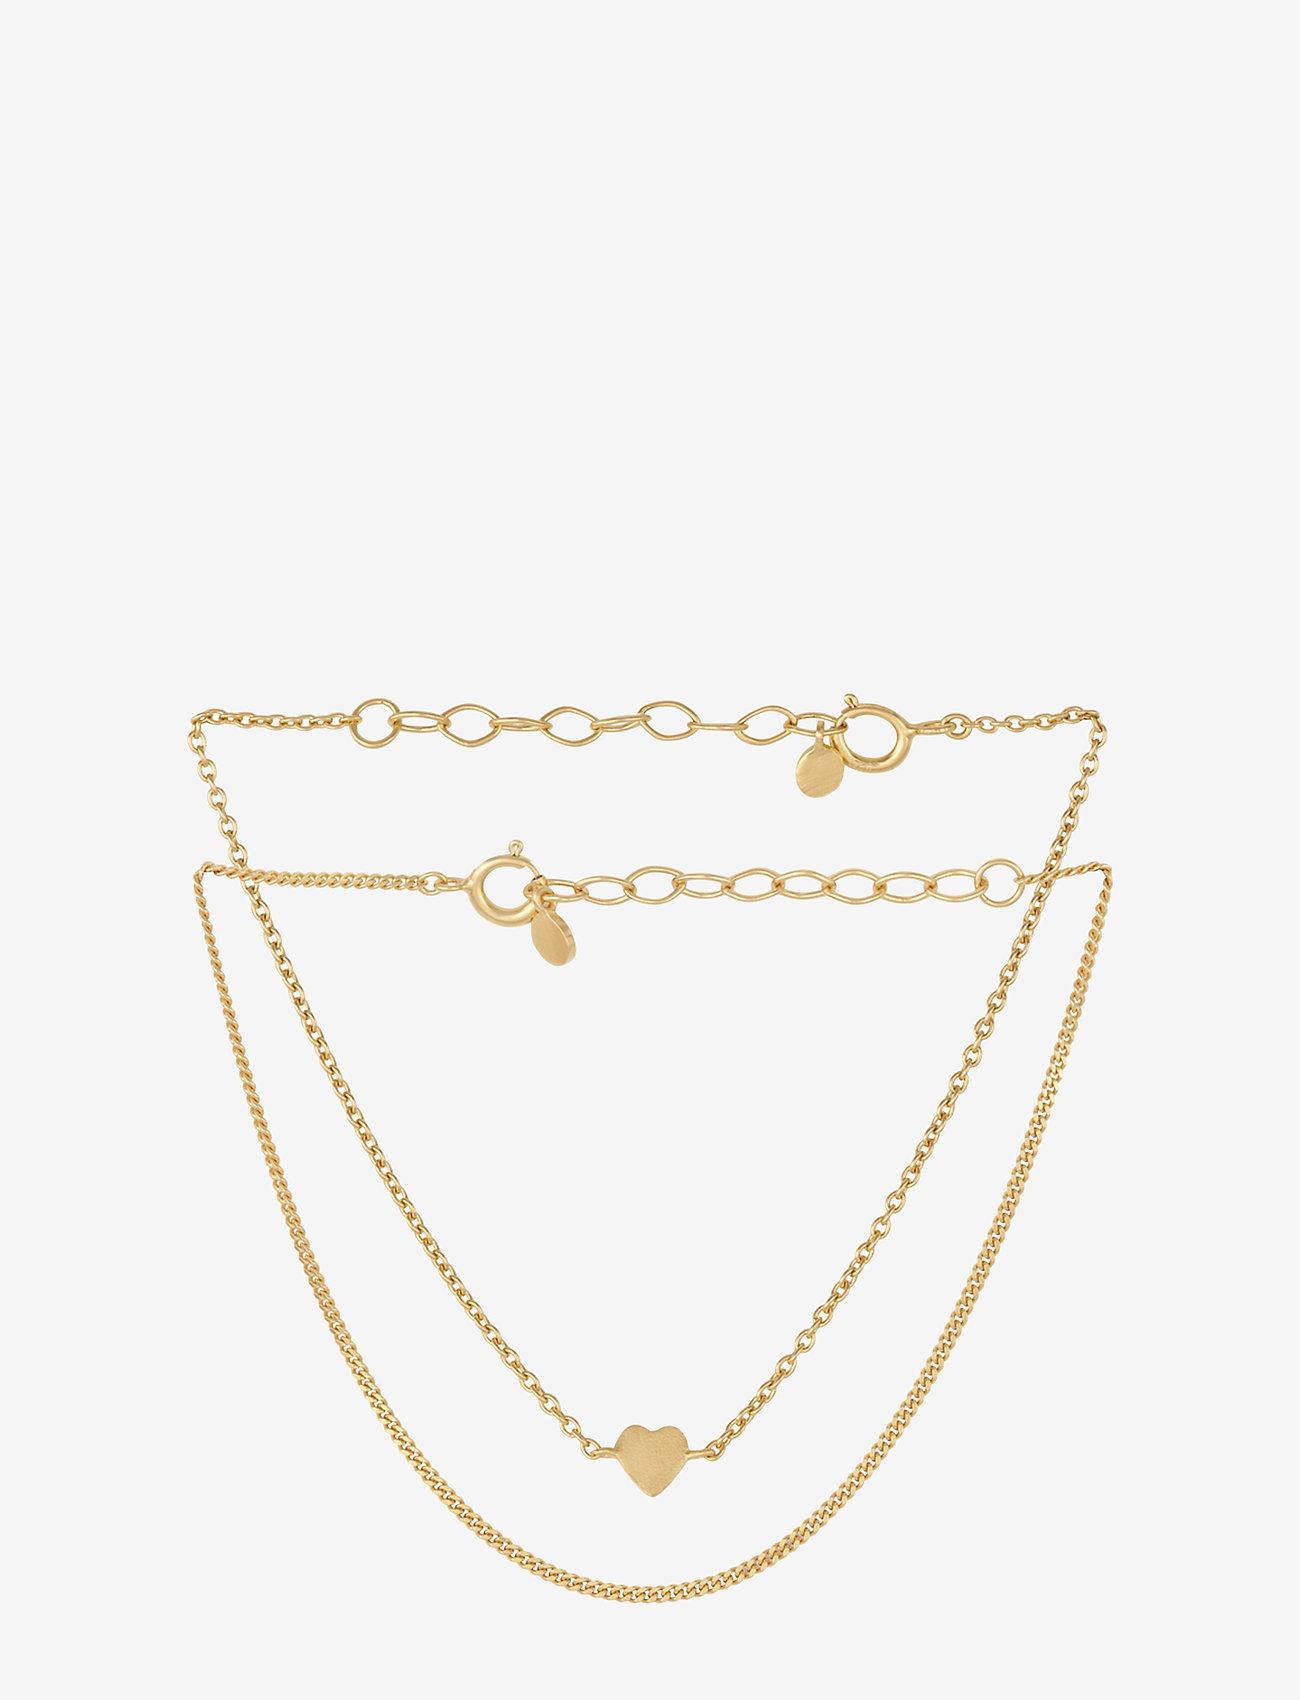 Pernille Corydon - Moment Bracelets Box - 15-18 cm adjustable - dainty - gold plated - 0